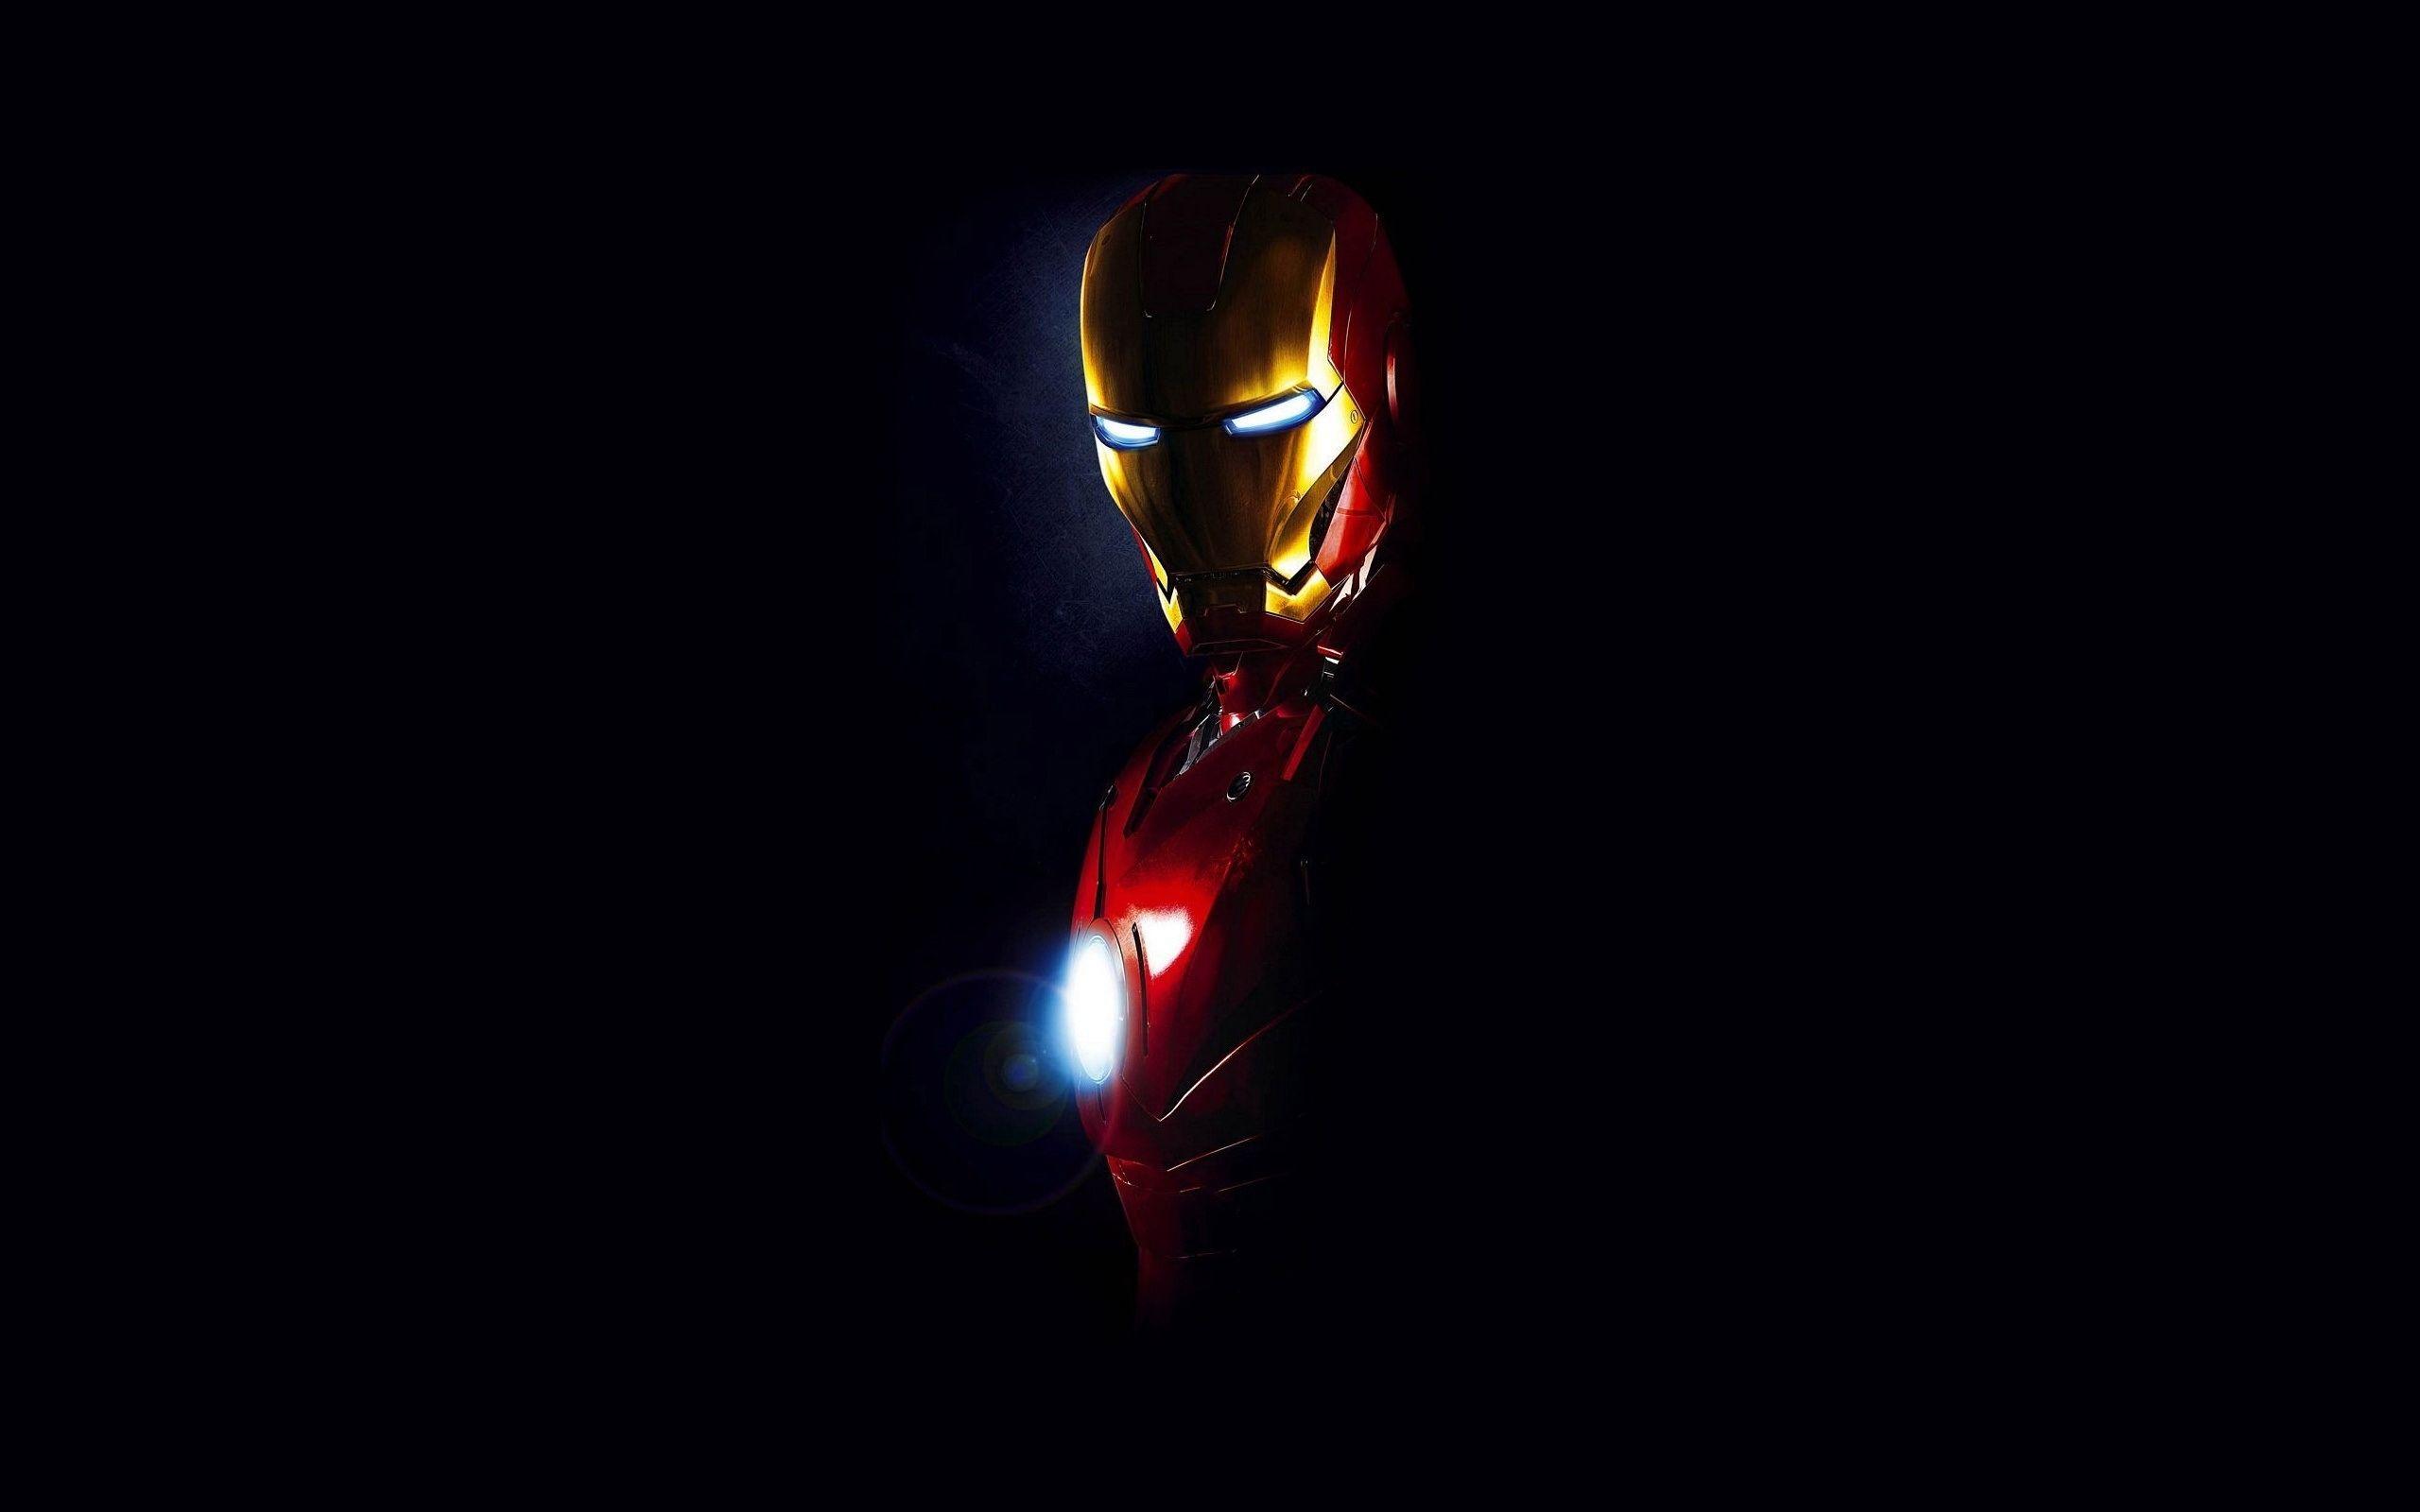 10 Best Iron Man Hd Wallpapers 1080p Full Hd 1920 1080 For Pc Background Iron Man Wallpaper Iron Man Hd Wallpaper Man Wallpaper